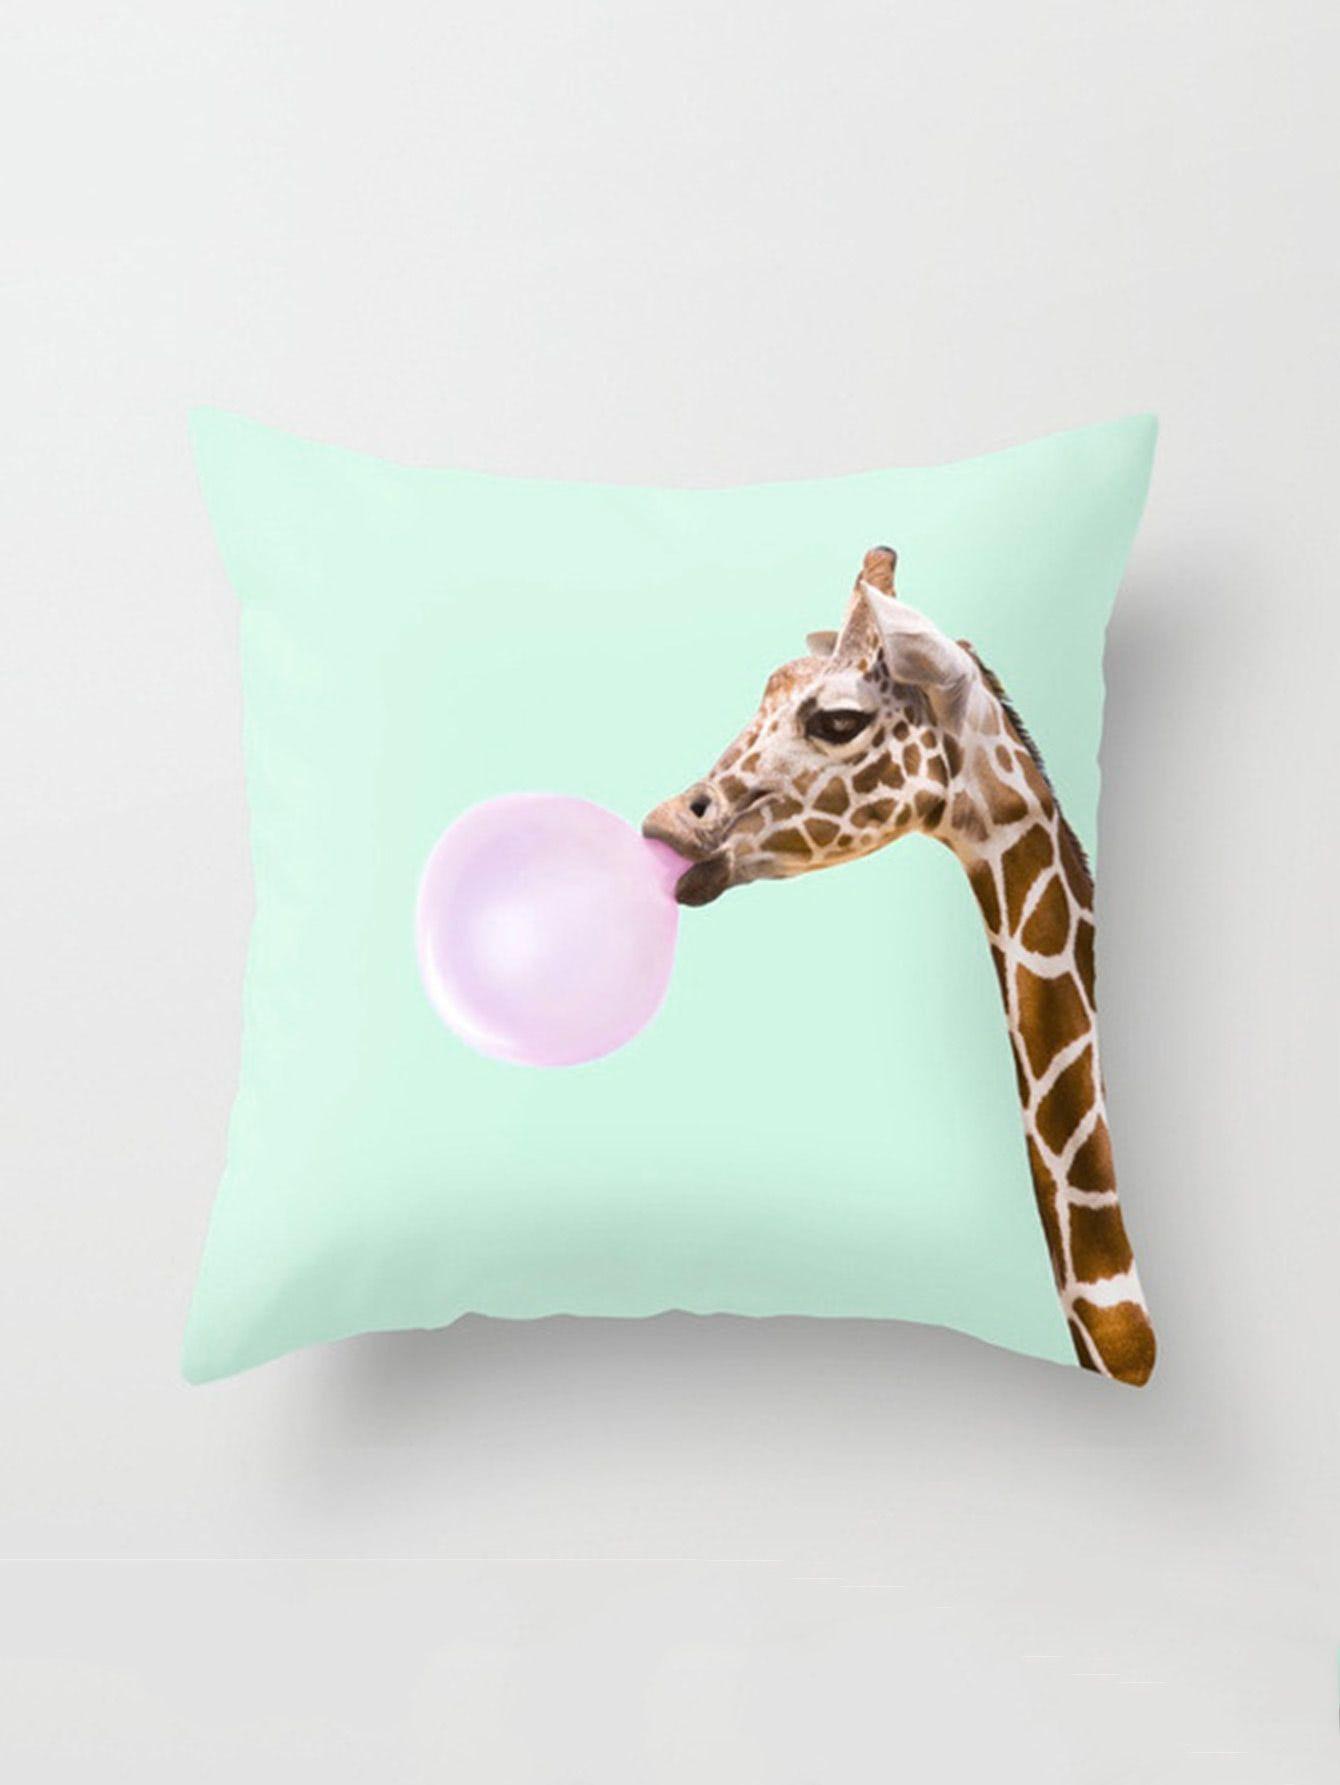 Shop Giraffe Print Pillowcase Cover Online Shein Offers Giraffe Print Pillowcase Cover More To Giraffe Throw Pillow Unicorn Throw Pillow Printed Pillowcases